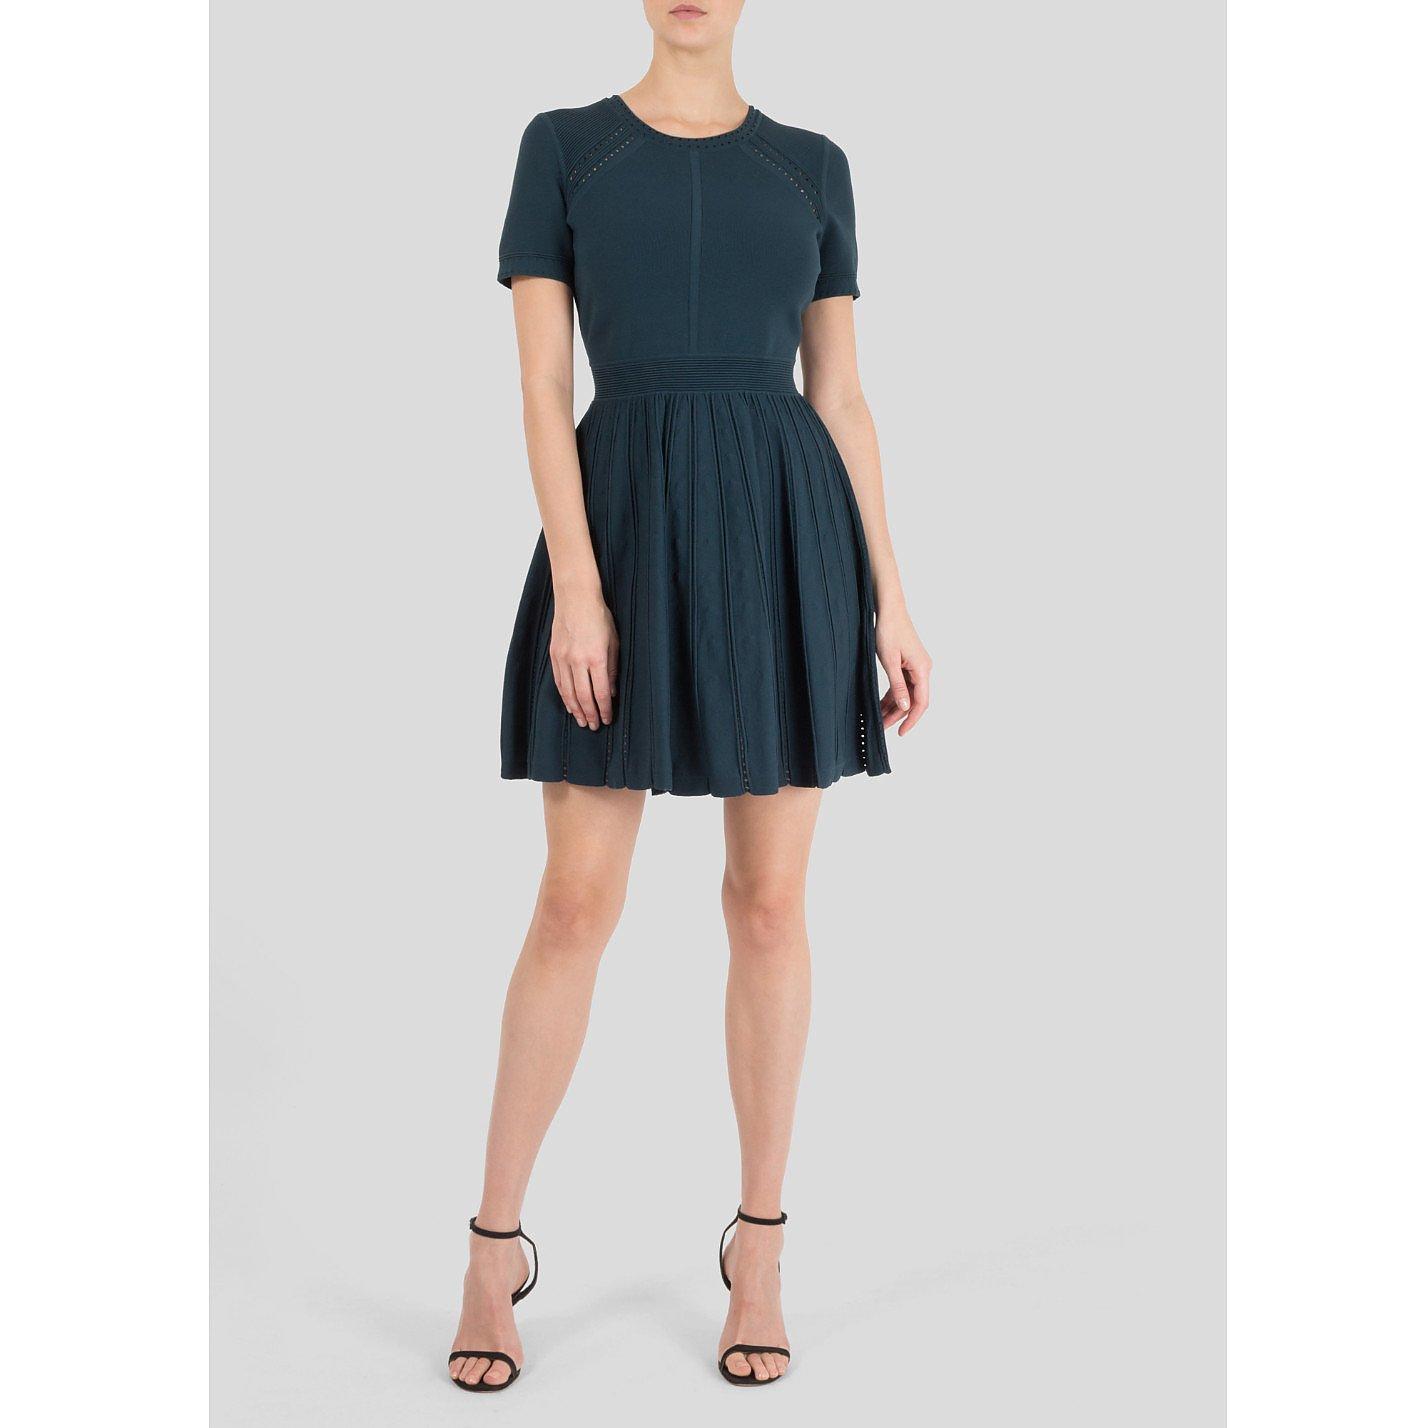 Milly Pointelle Stretch-Knit Mini Dress